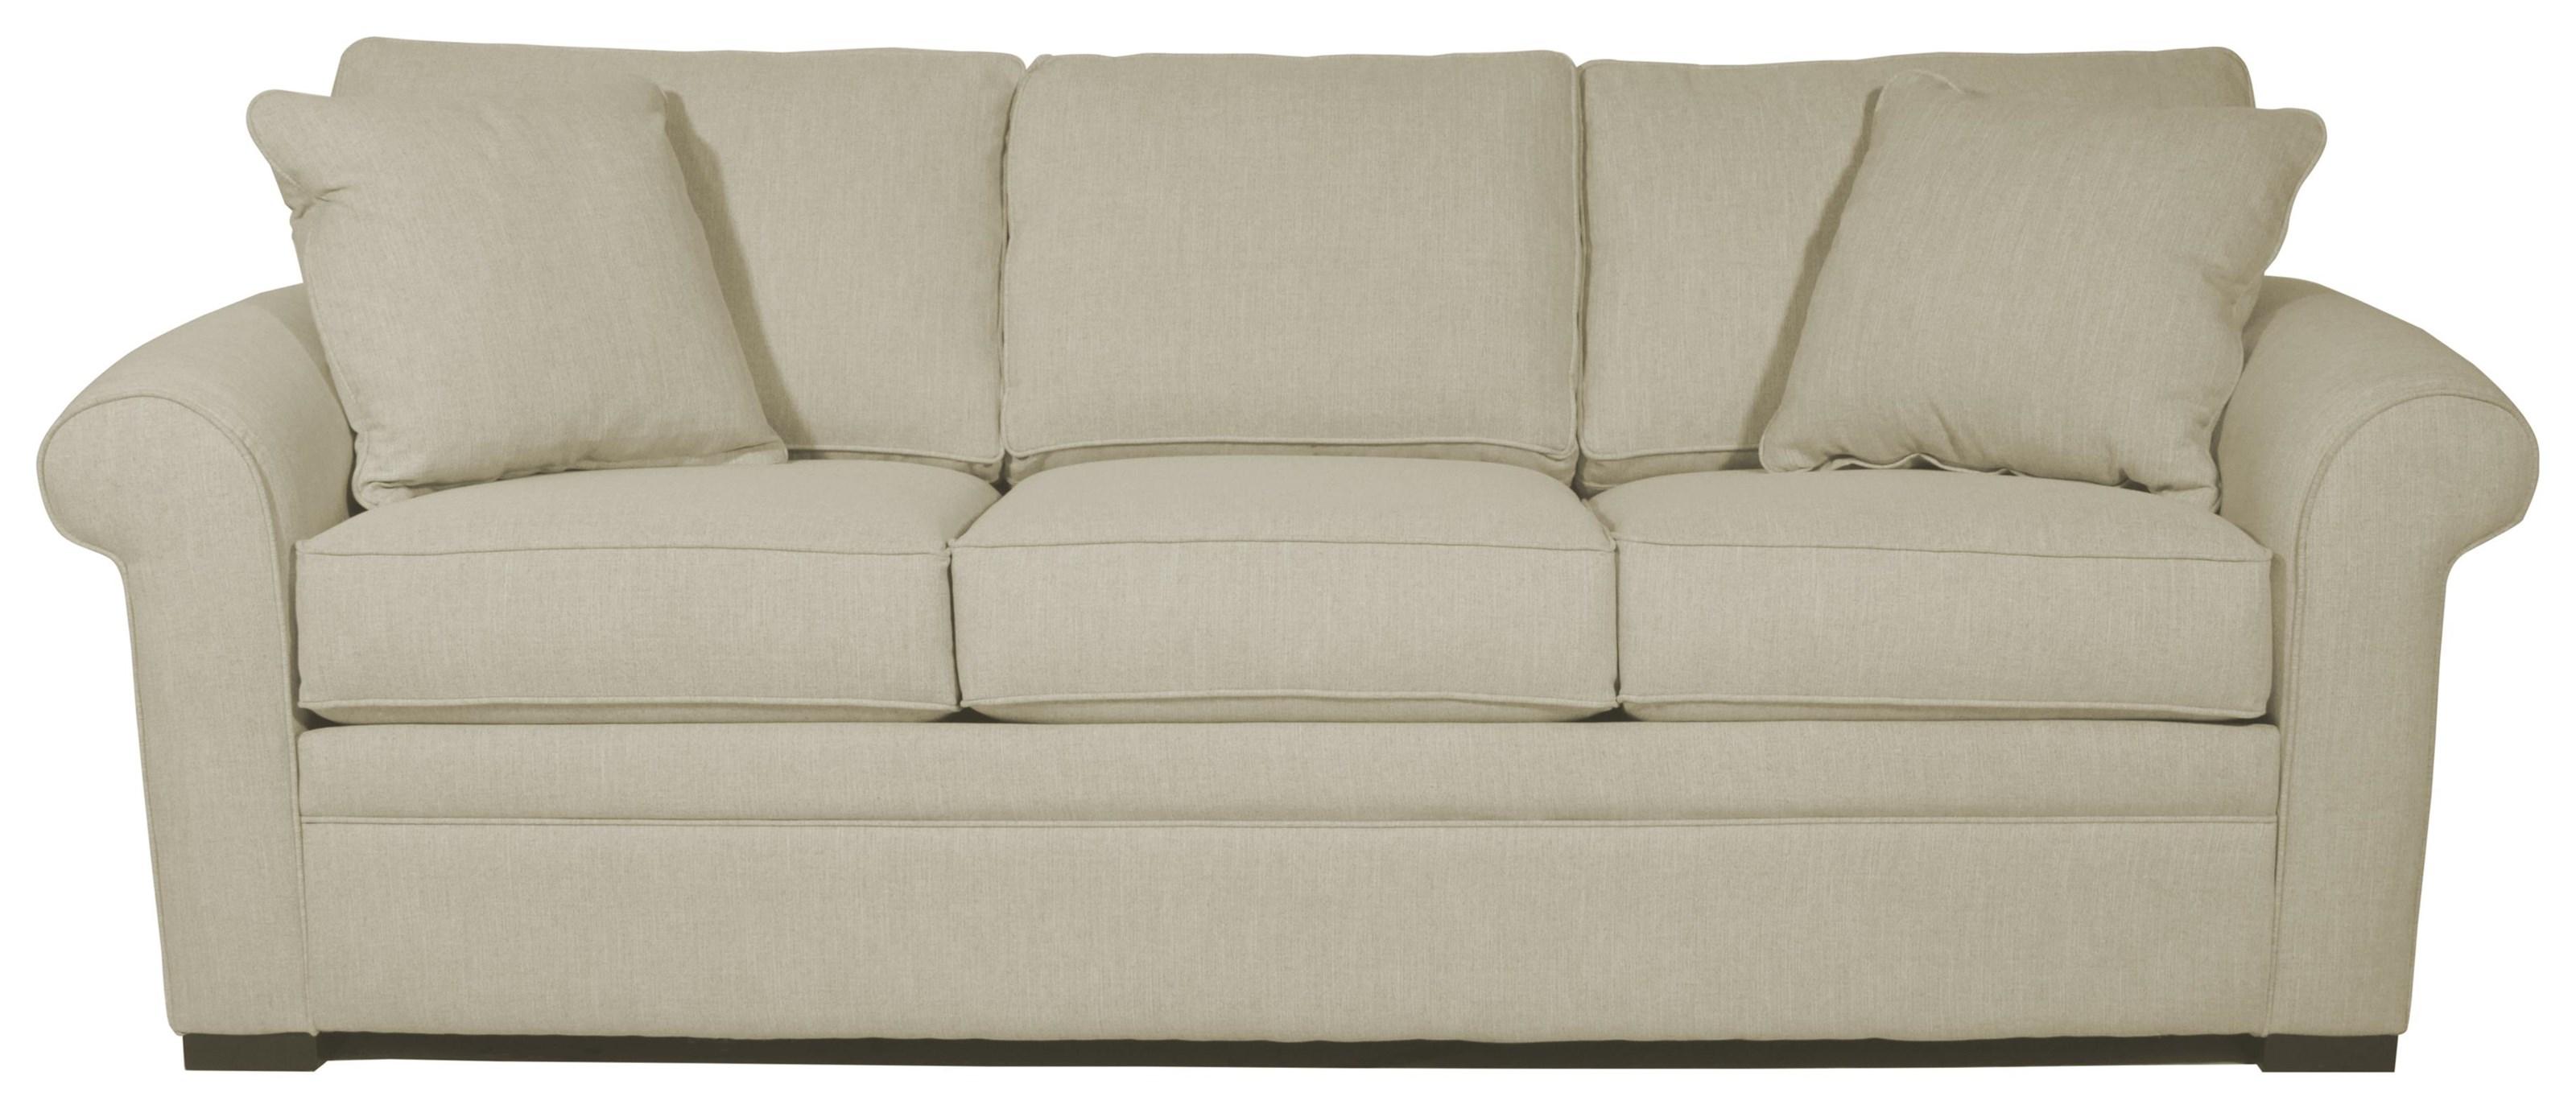 Dozy Queen Sofa Sleeper by Jonathan Louis at HomeWorld Furniture